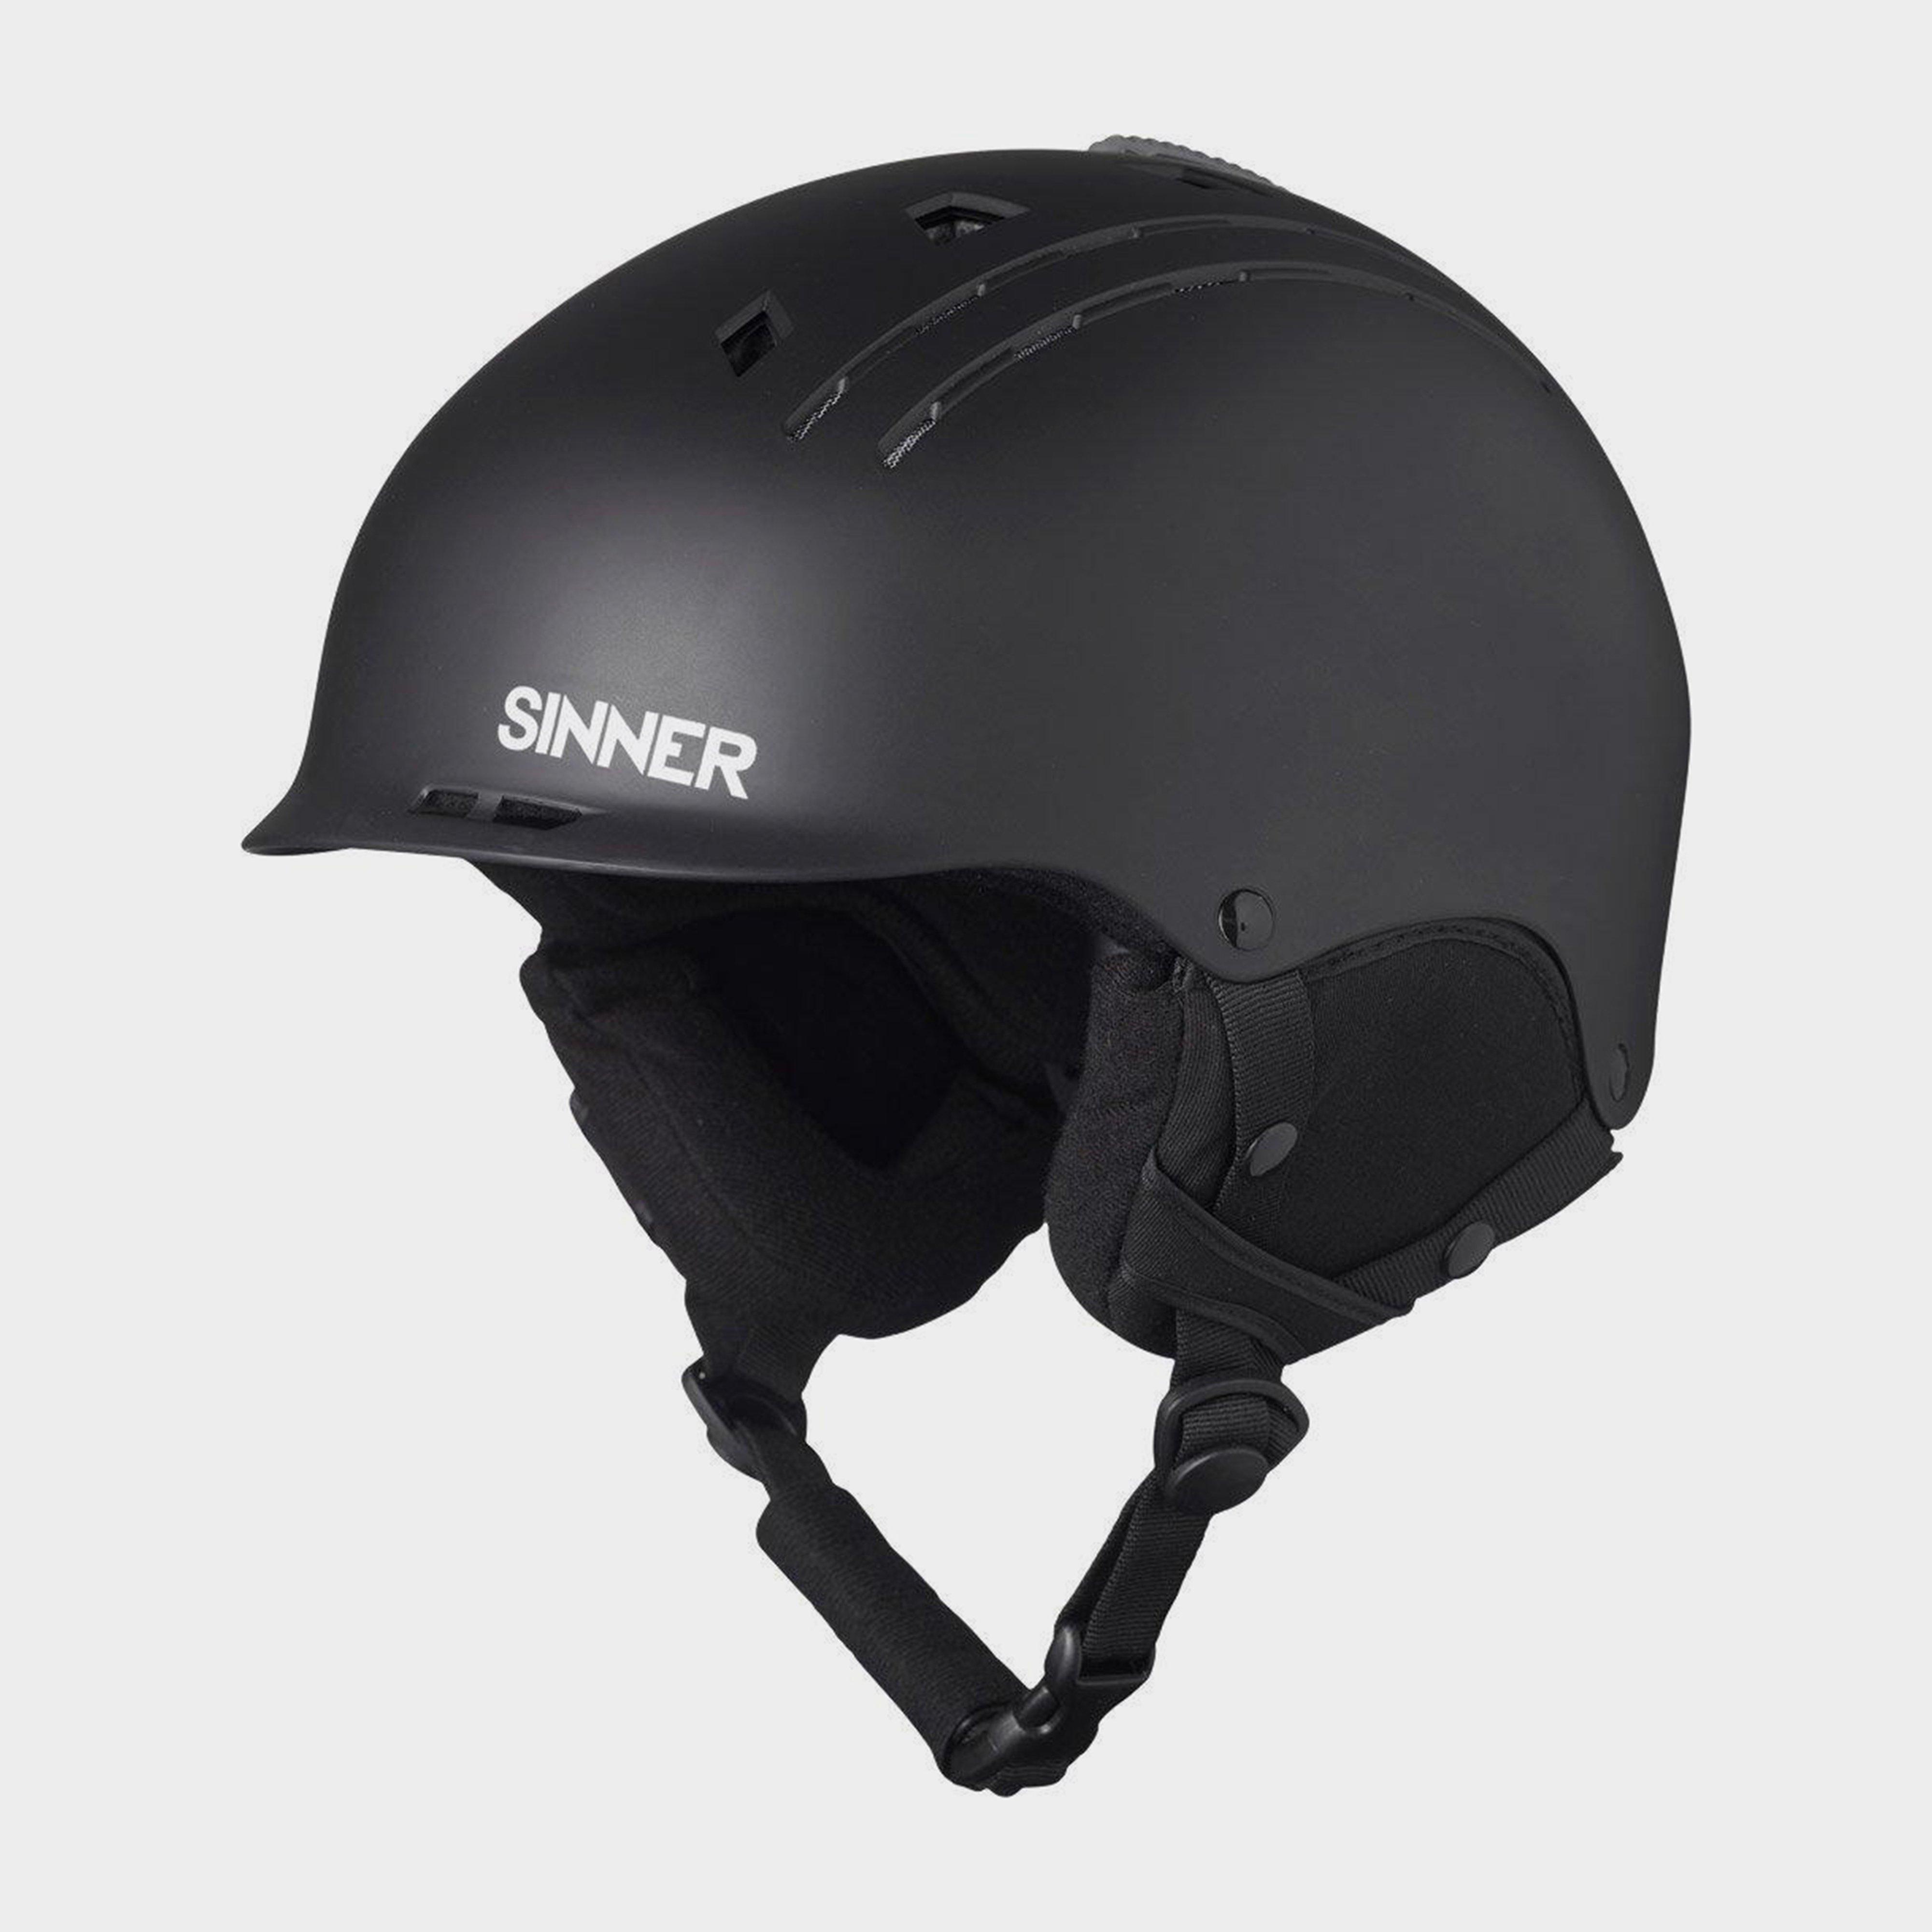 Sinner Pincher Helmet, BLK/BLK